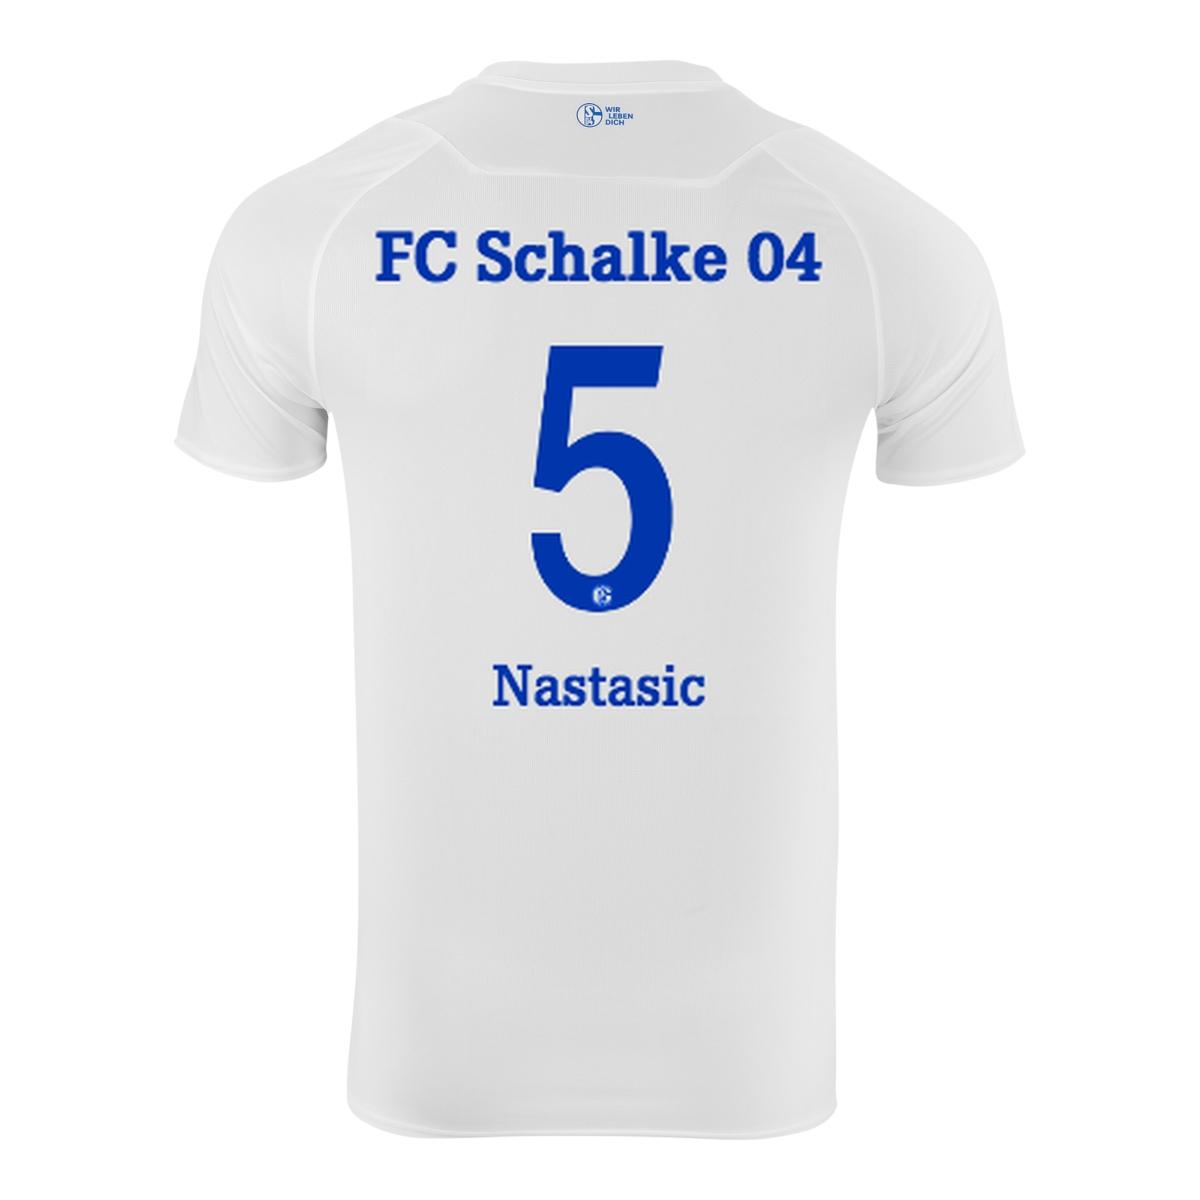 Maglie Schalke 04 2020-2021, Umbro omaggia Gelsenkirchen